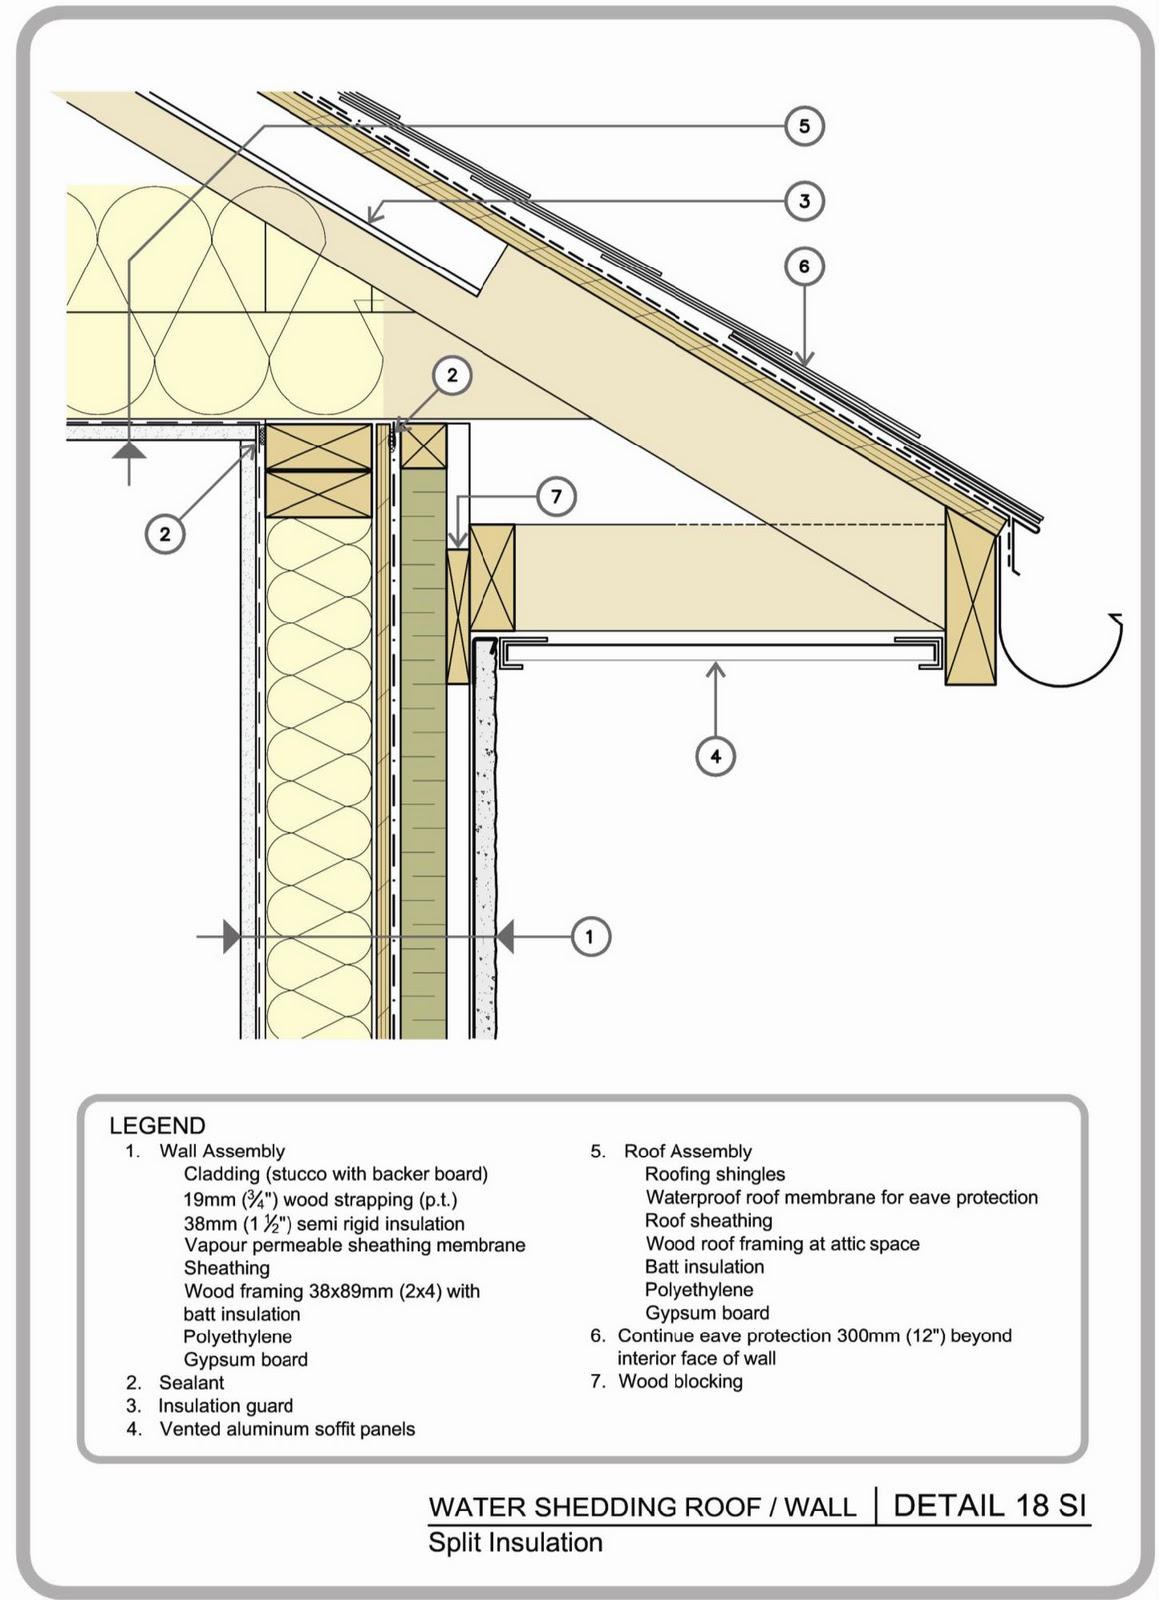 Best Practice Guide - Split Insulation | Borealis Building